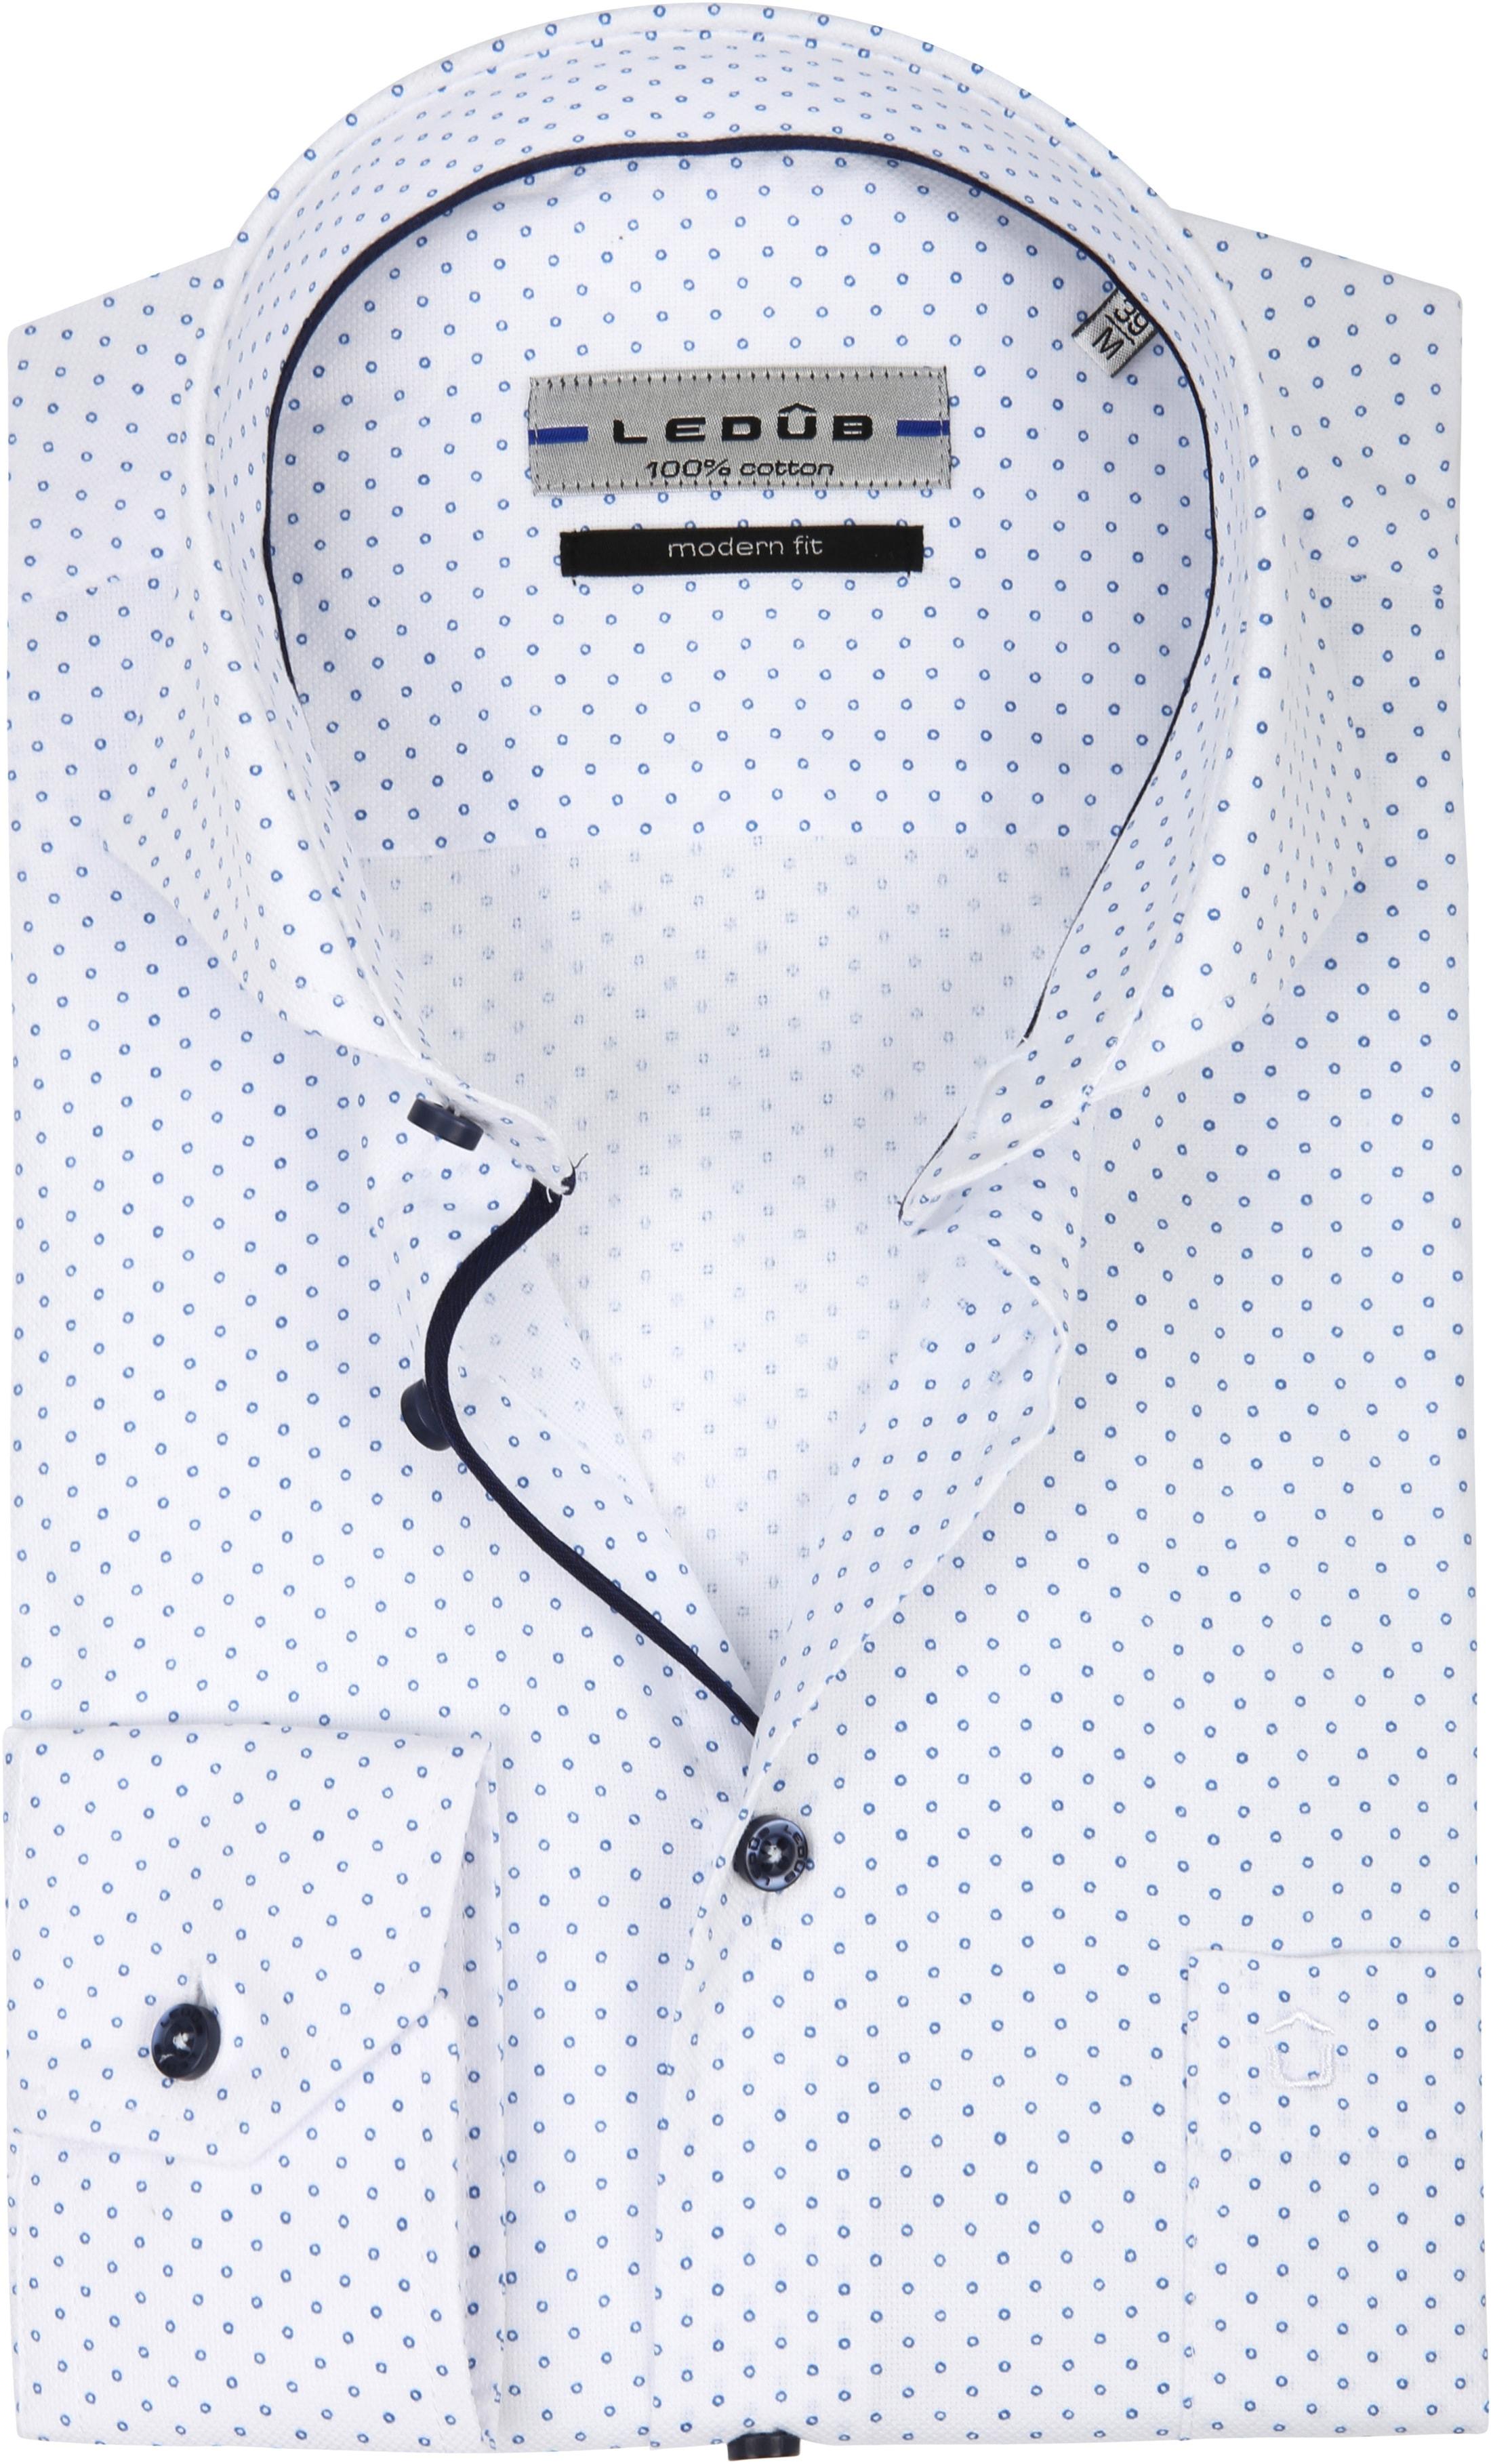 Ledub Overhemd MF Cirkel Wit foto 0